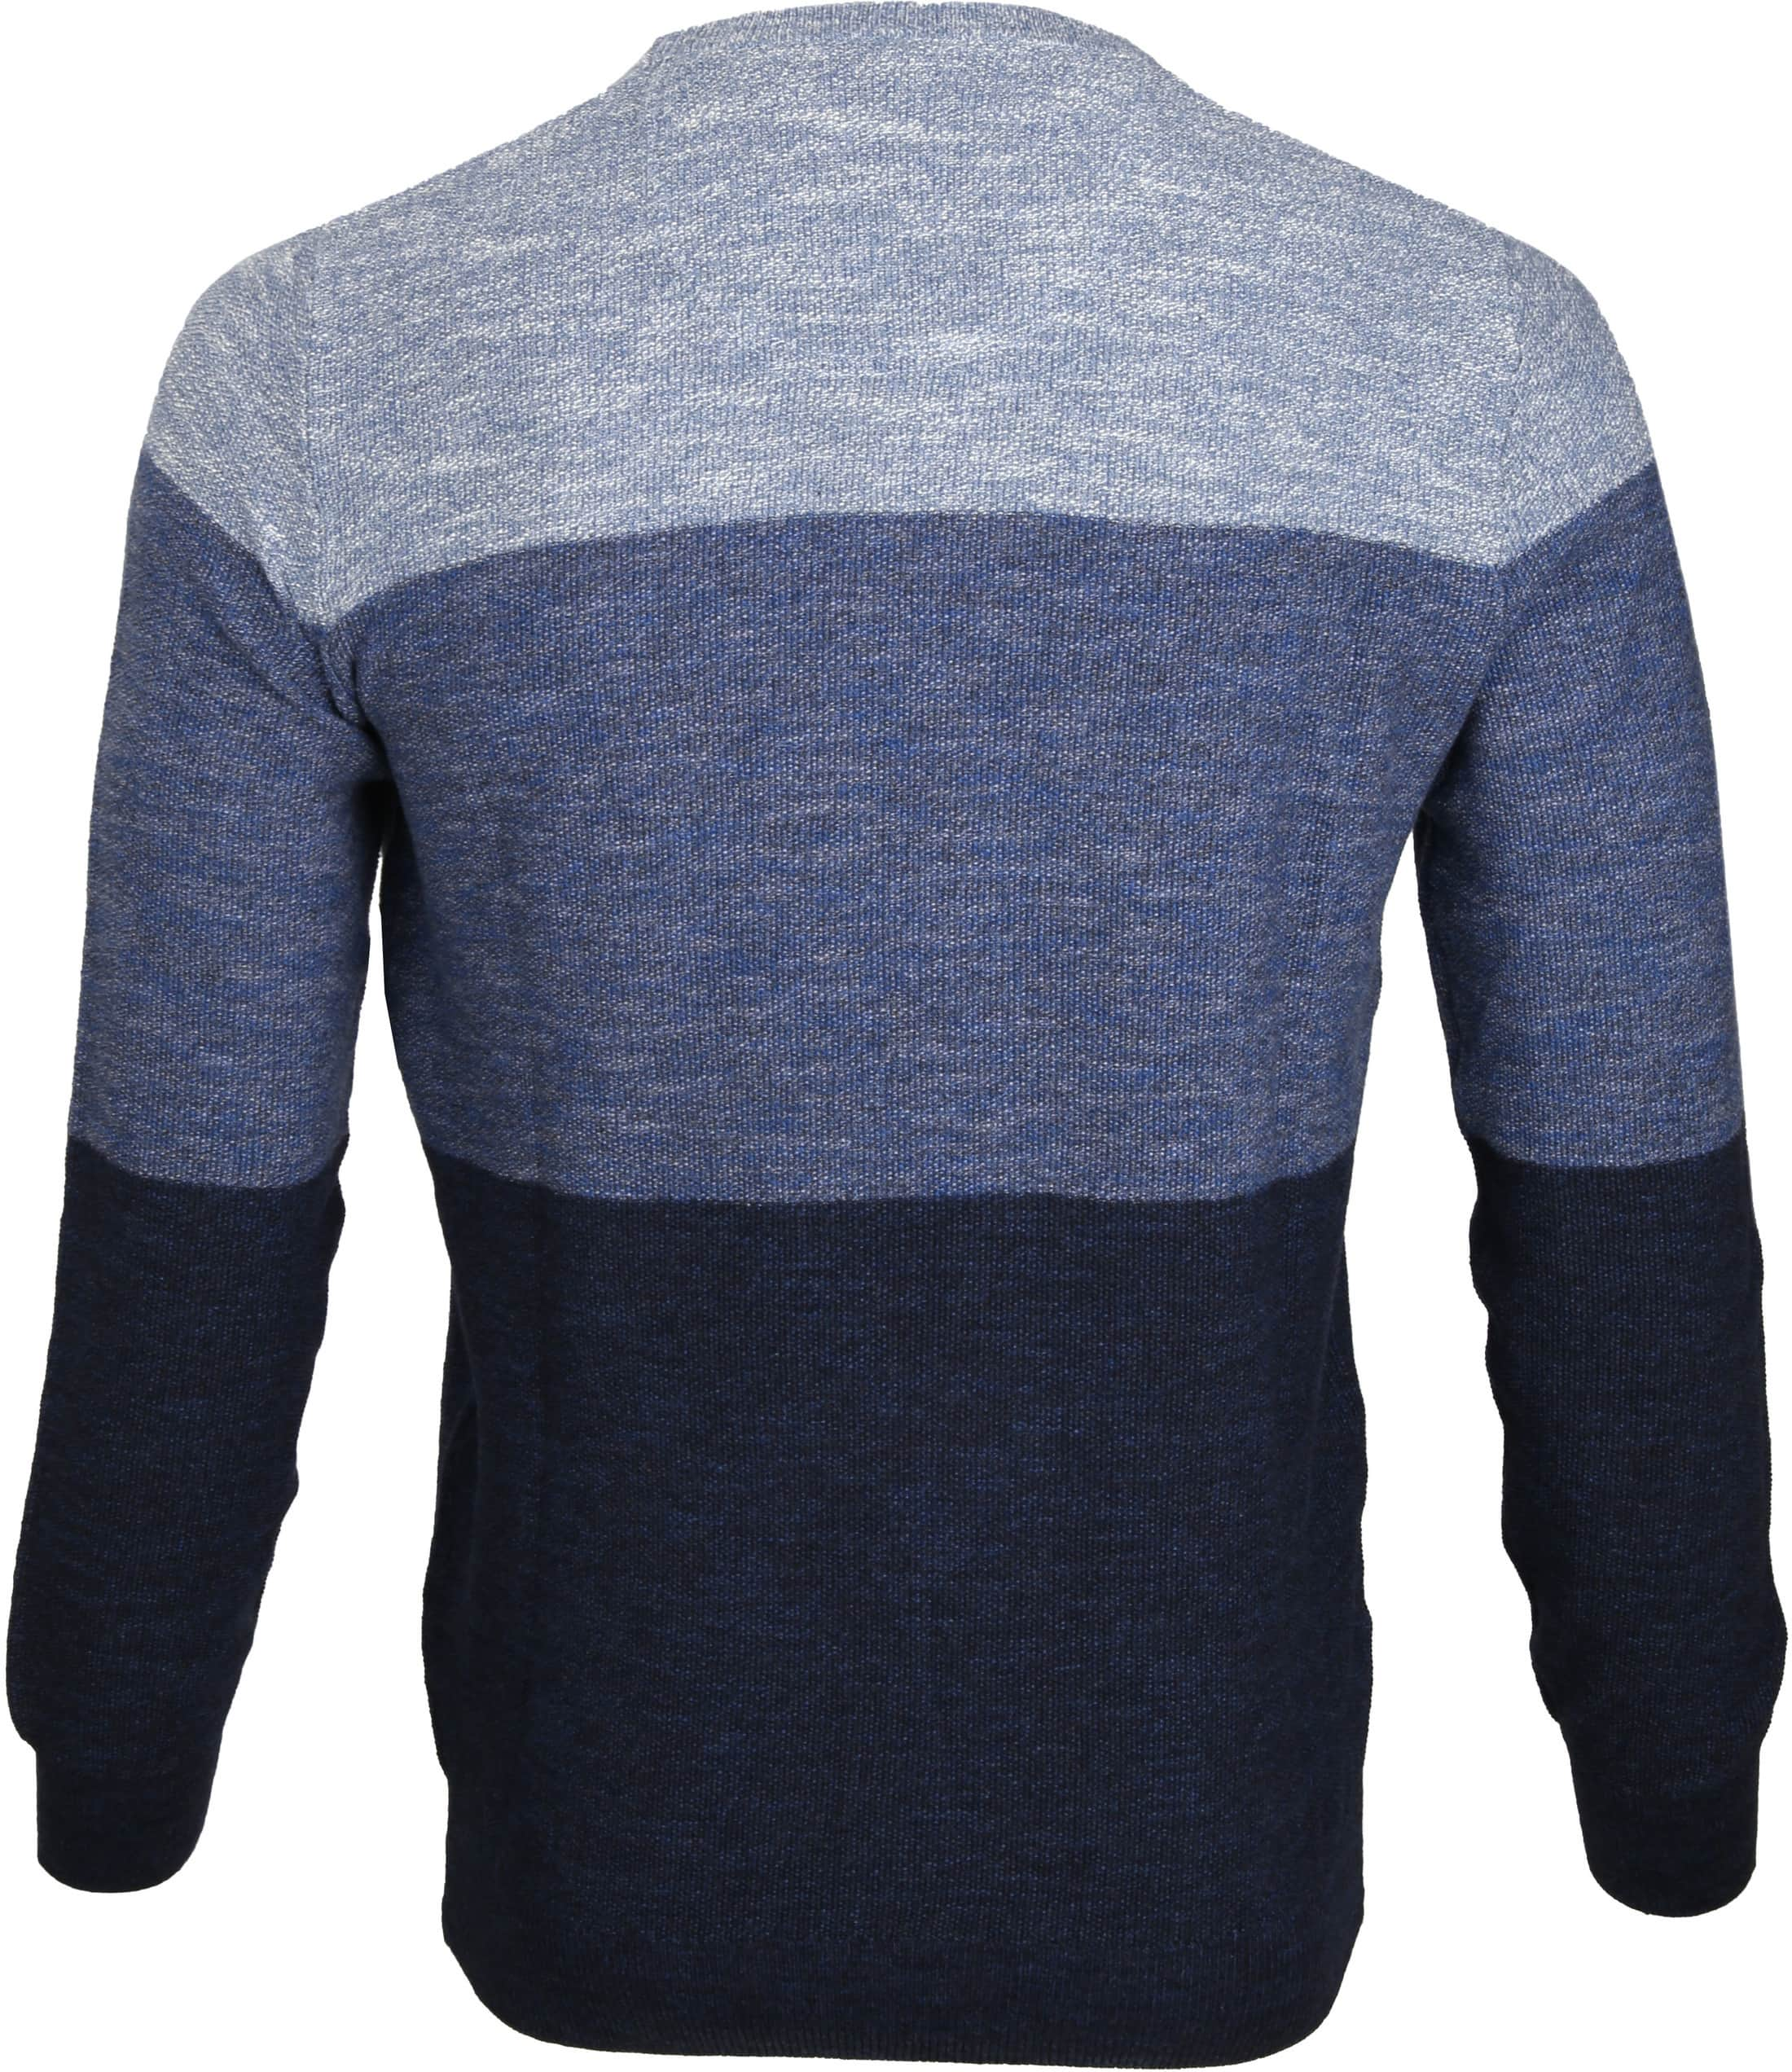 Suitable Pullover Colour Blocks Blau foto 2